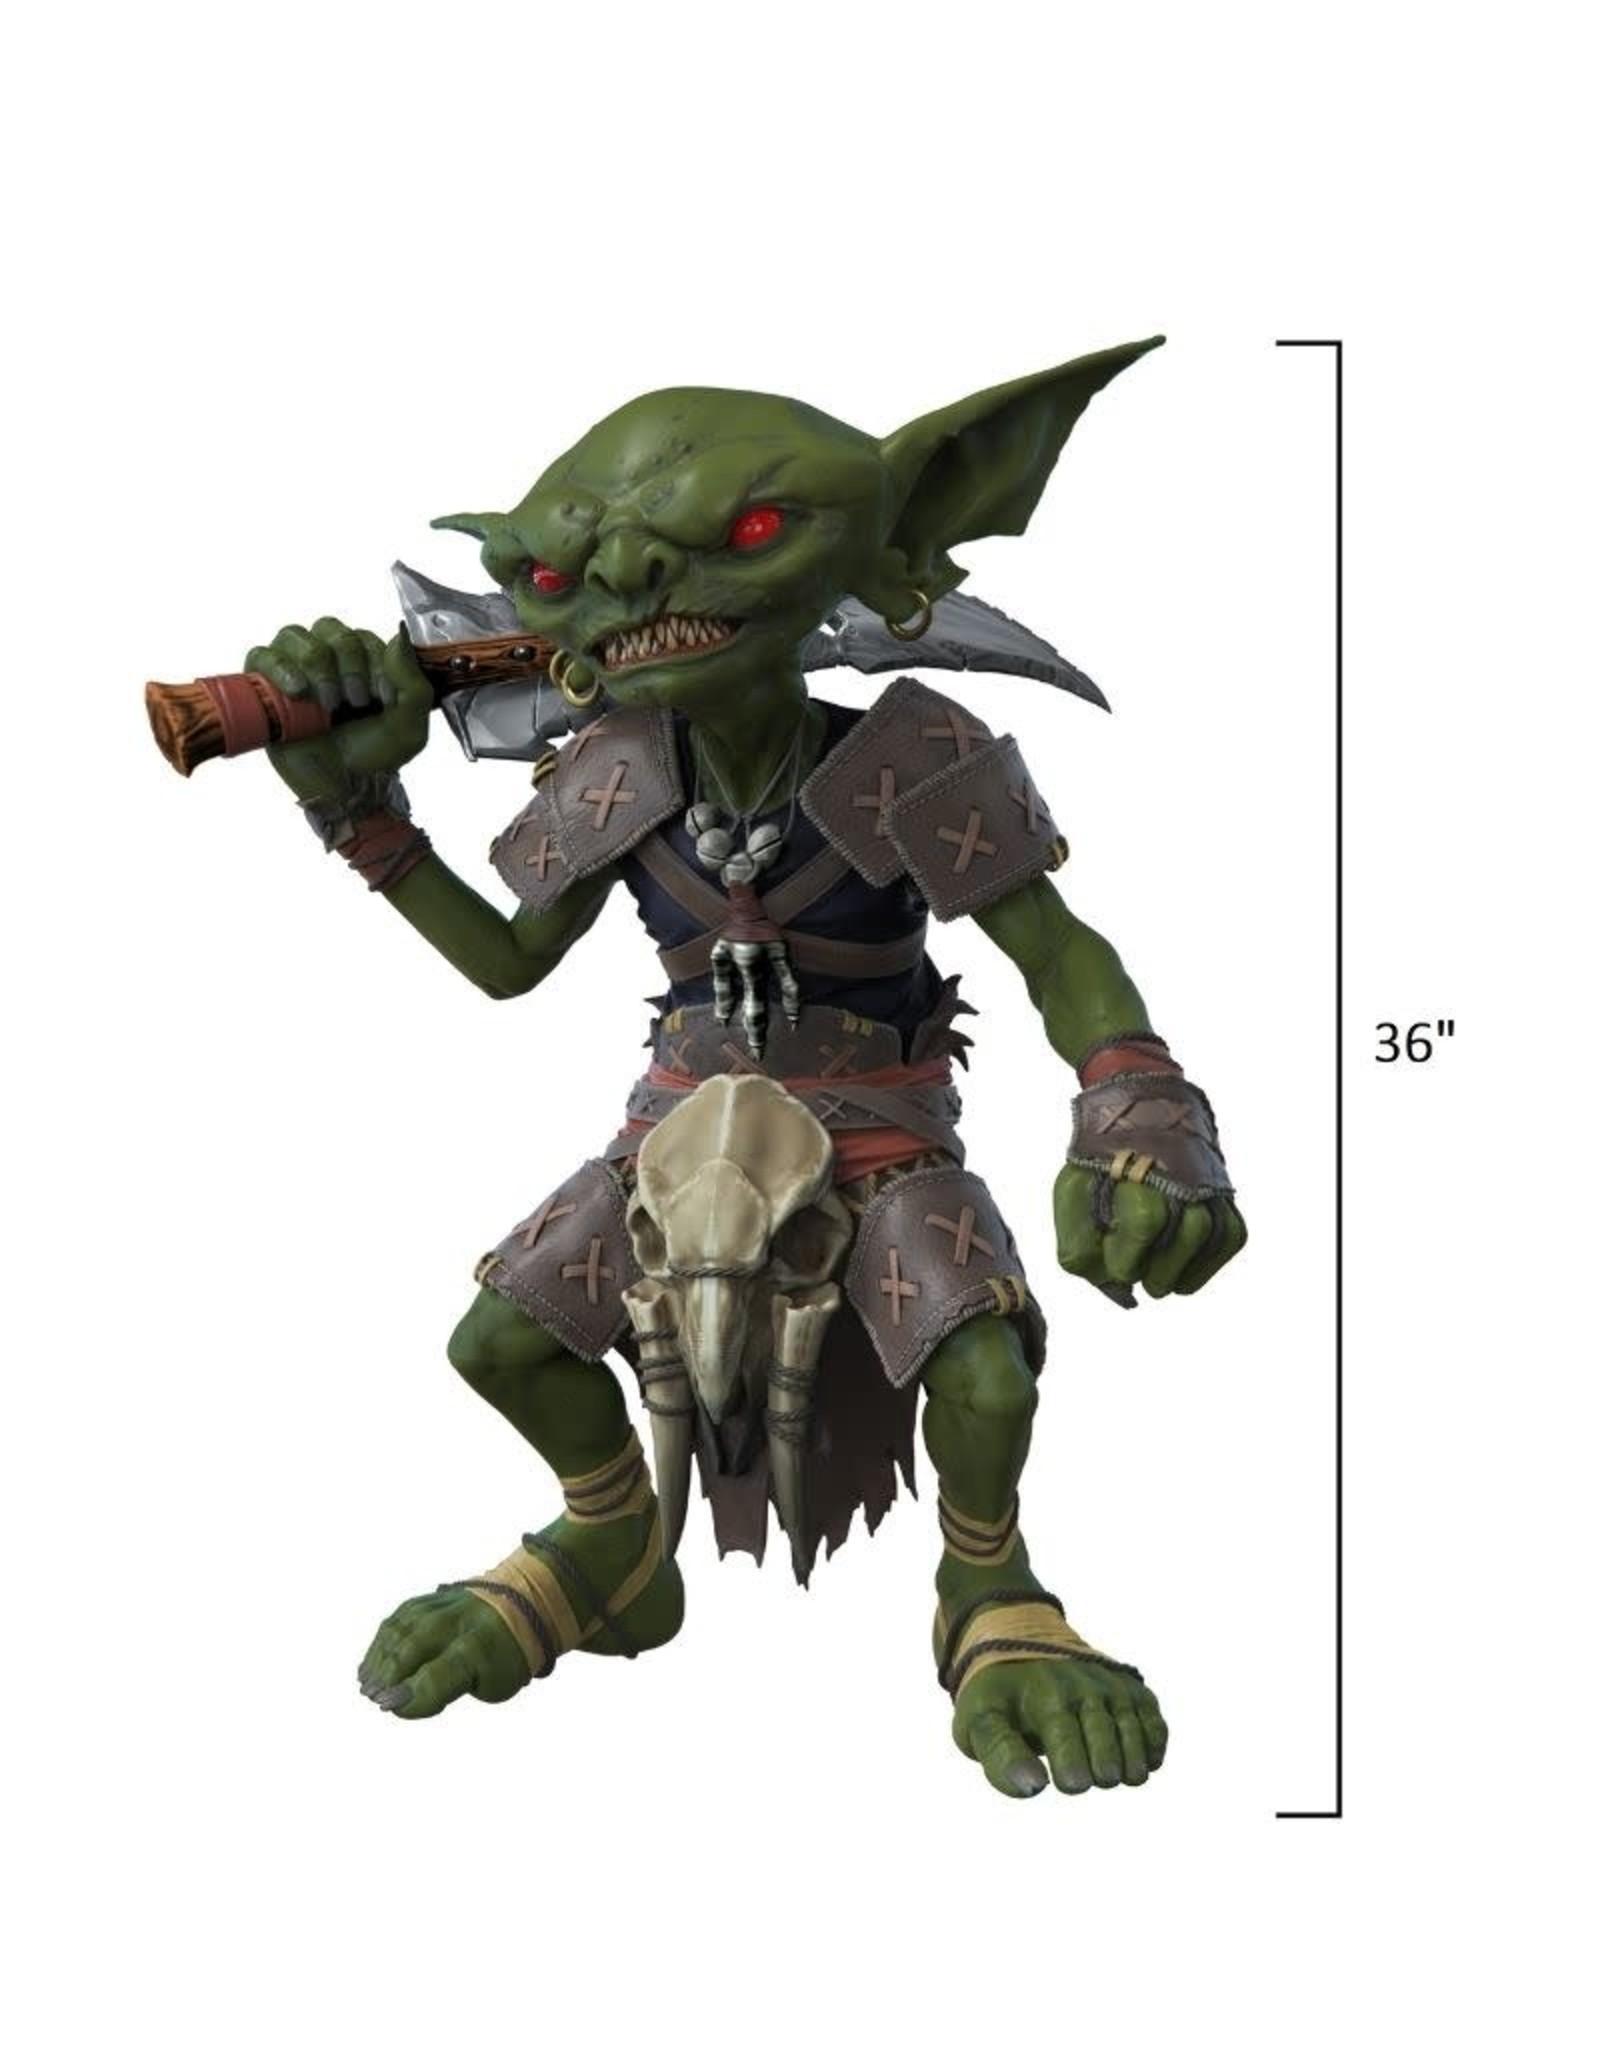 WizKids Pathfinder Foam Replica: Life Sized Goblin